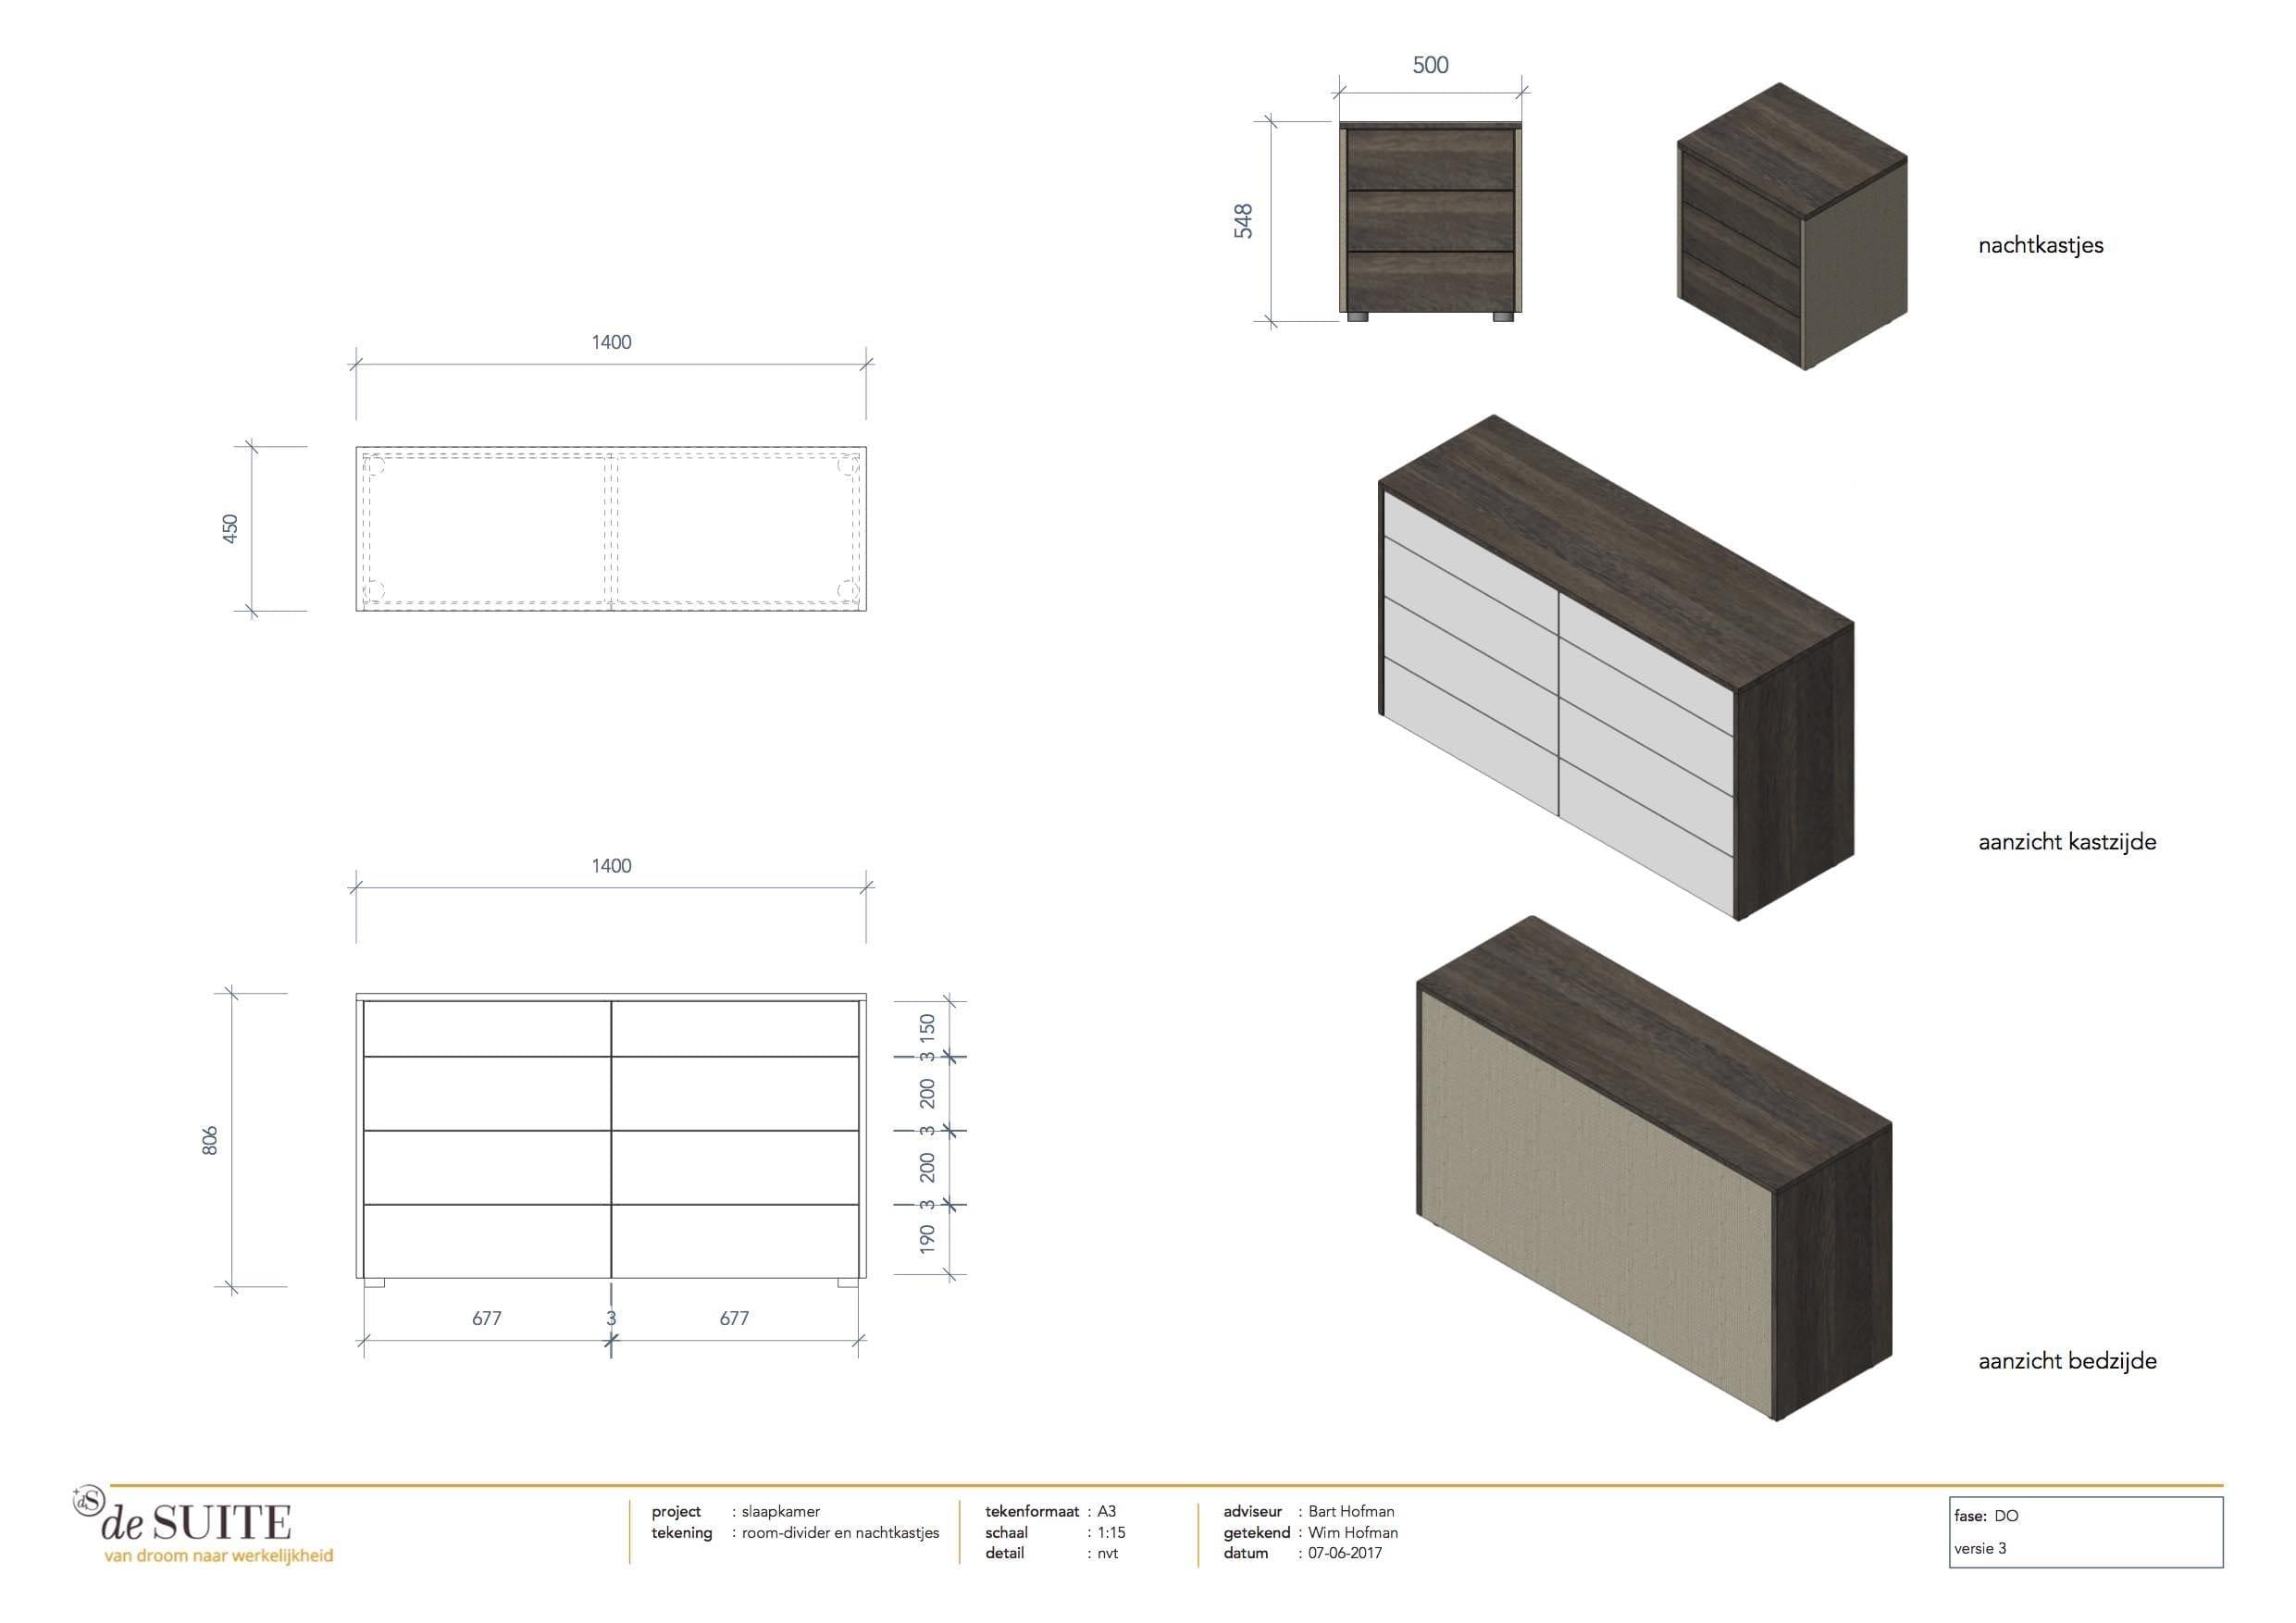 tekening room divider